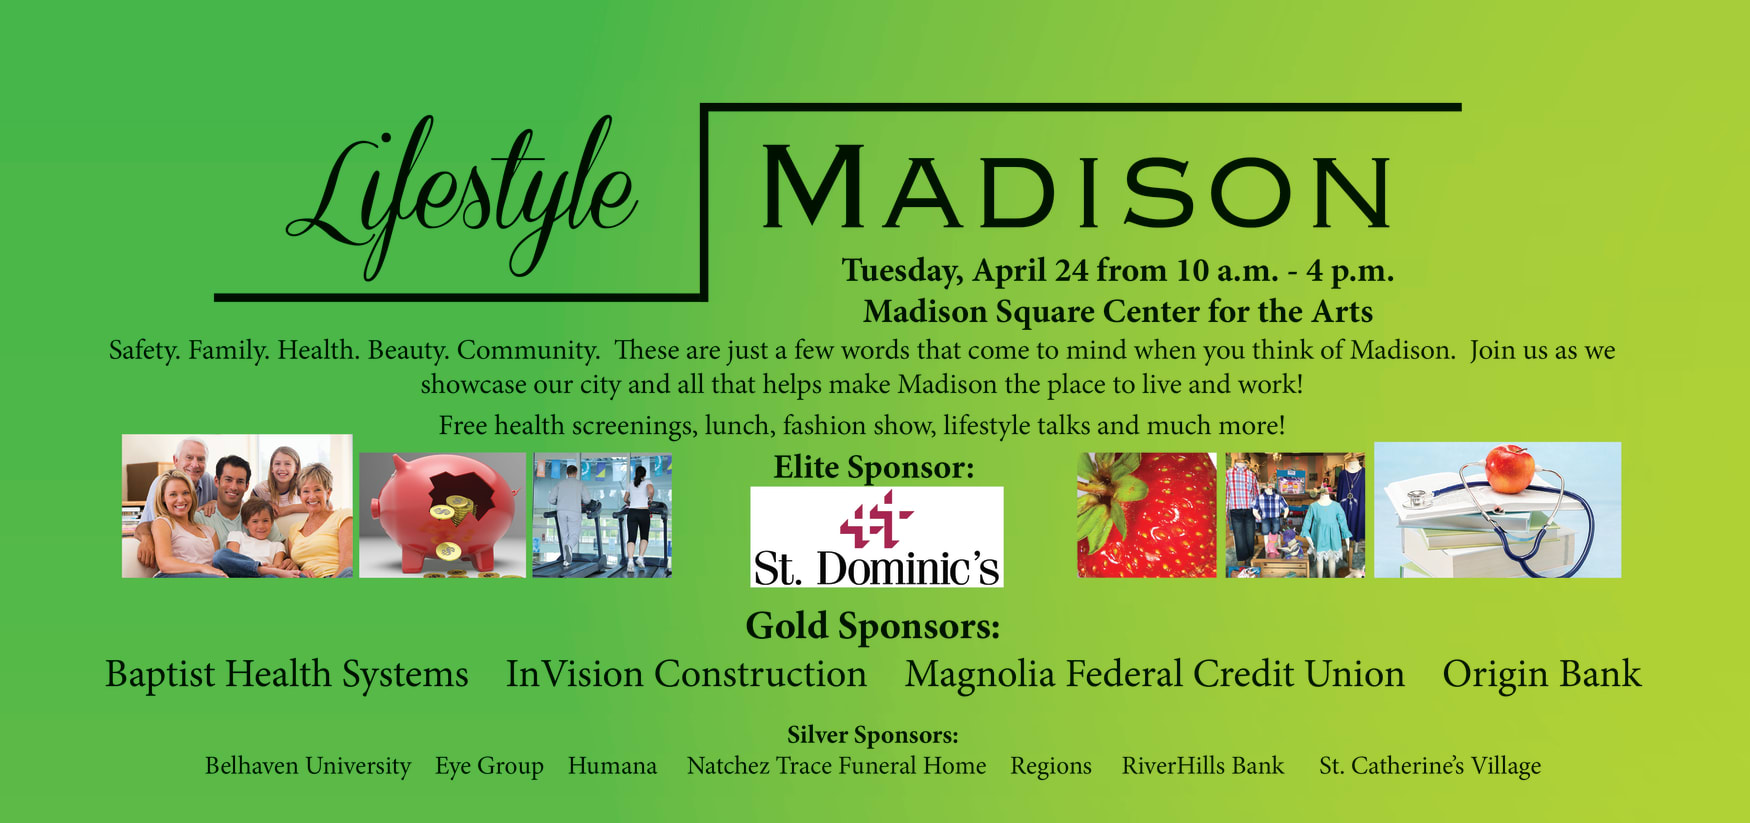 Lifestyle-Madison-cover-ad-w1750.jpg